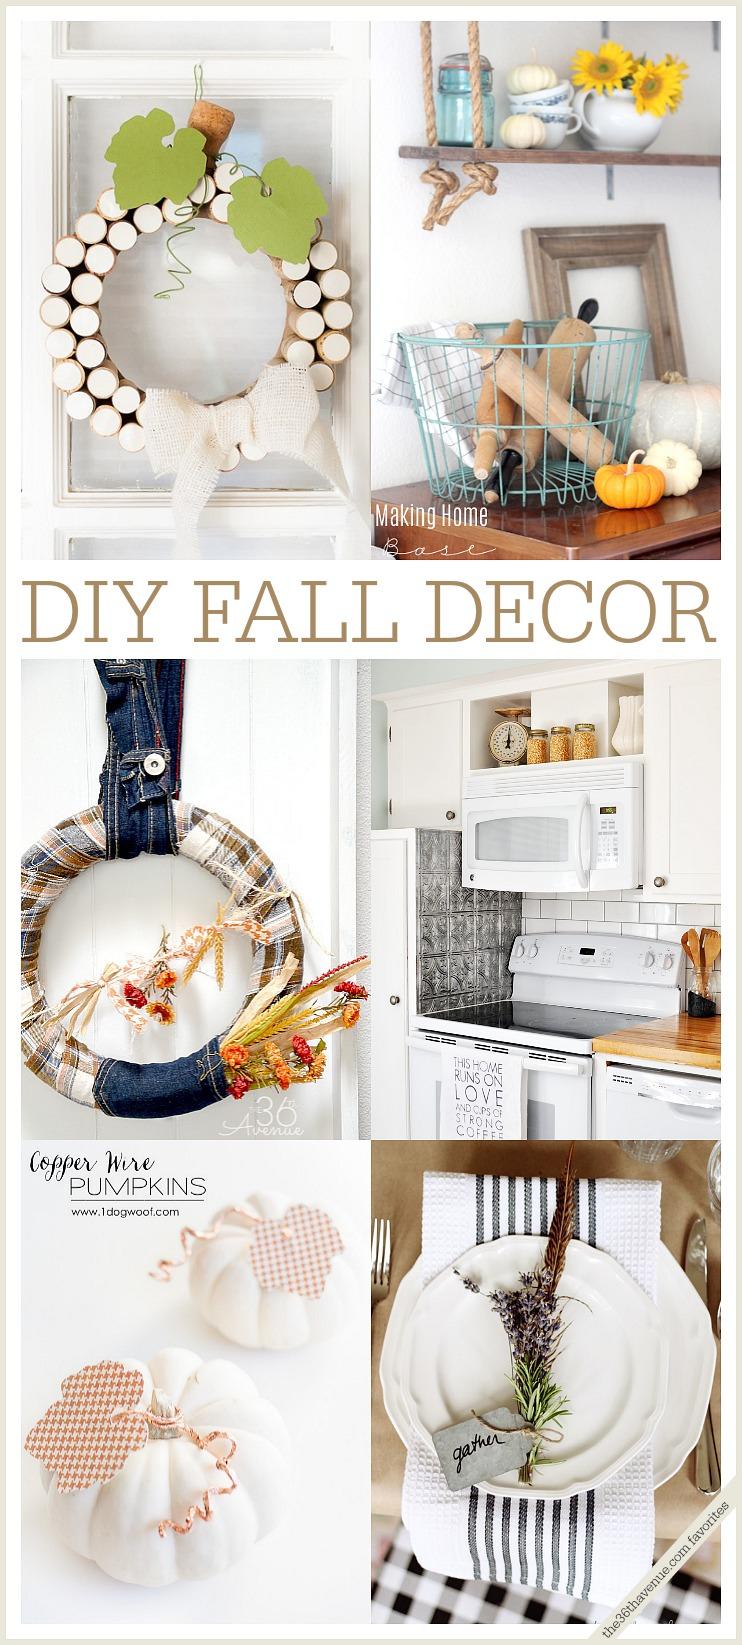 DIY Home Decor Ideas  The 36th AVENUE